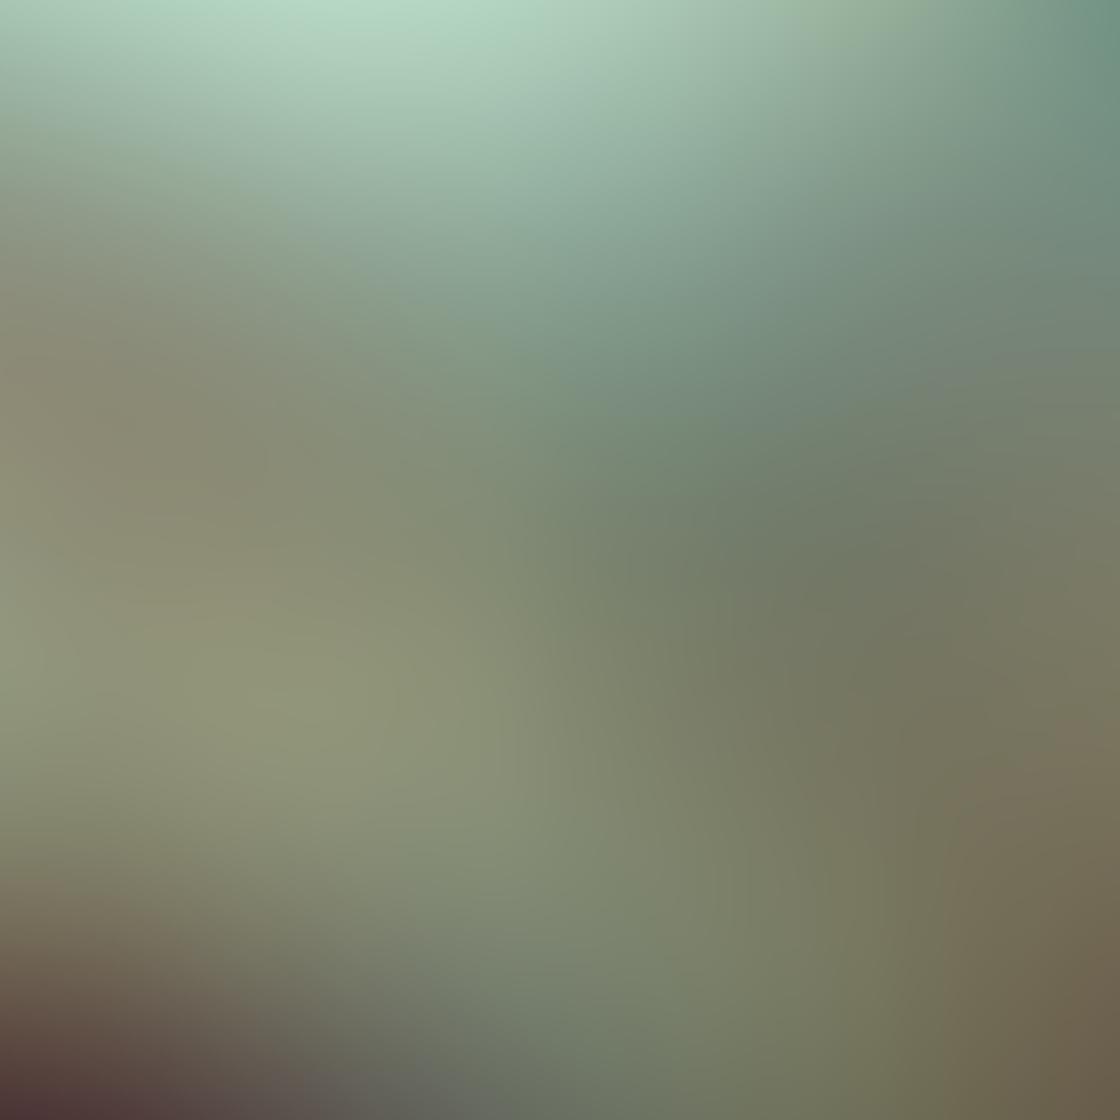 iPhone Weather Photo 31